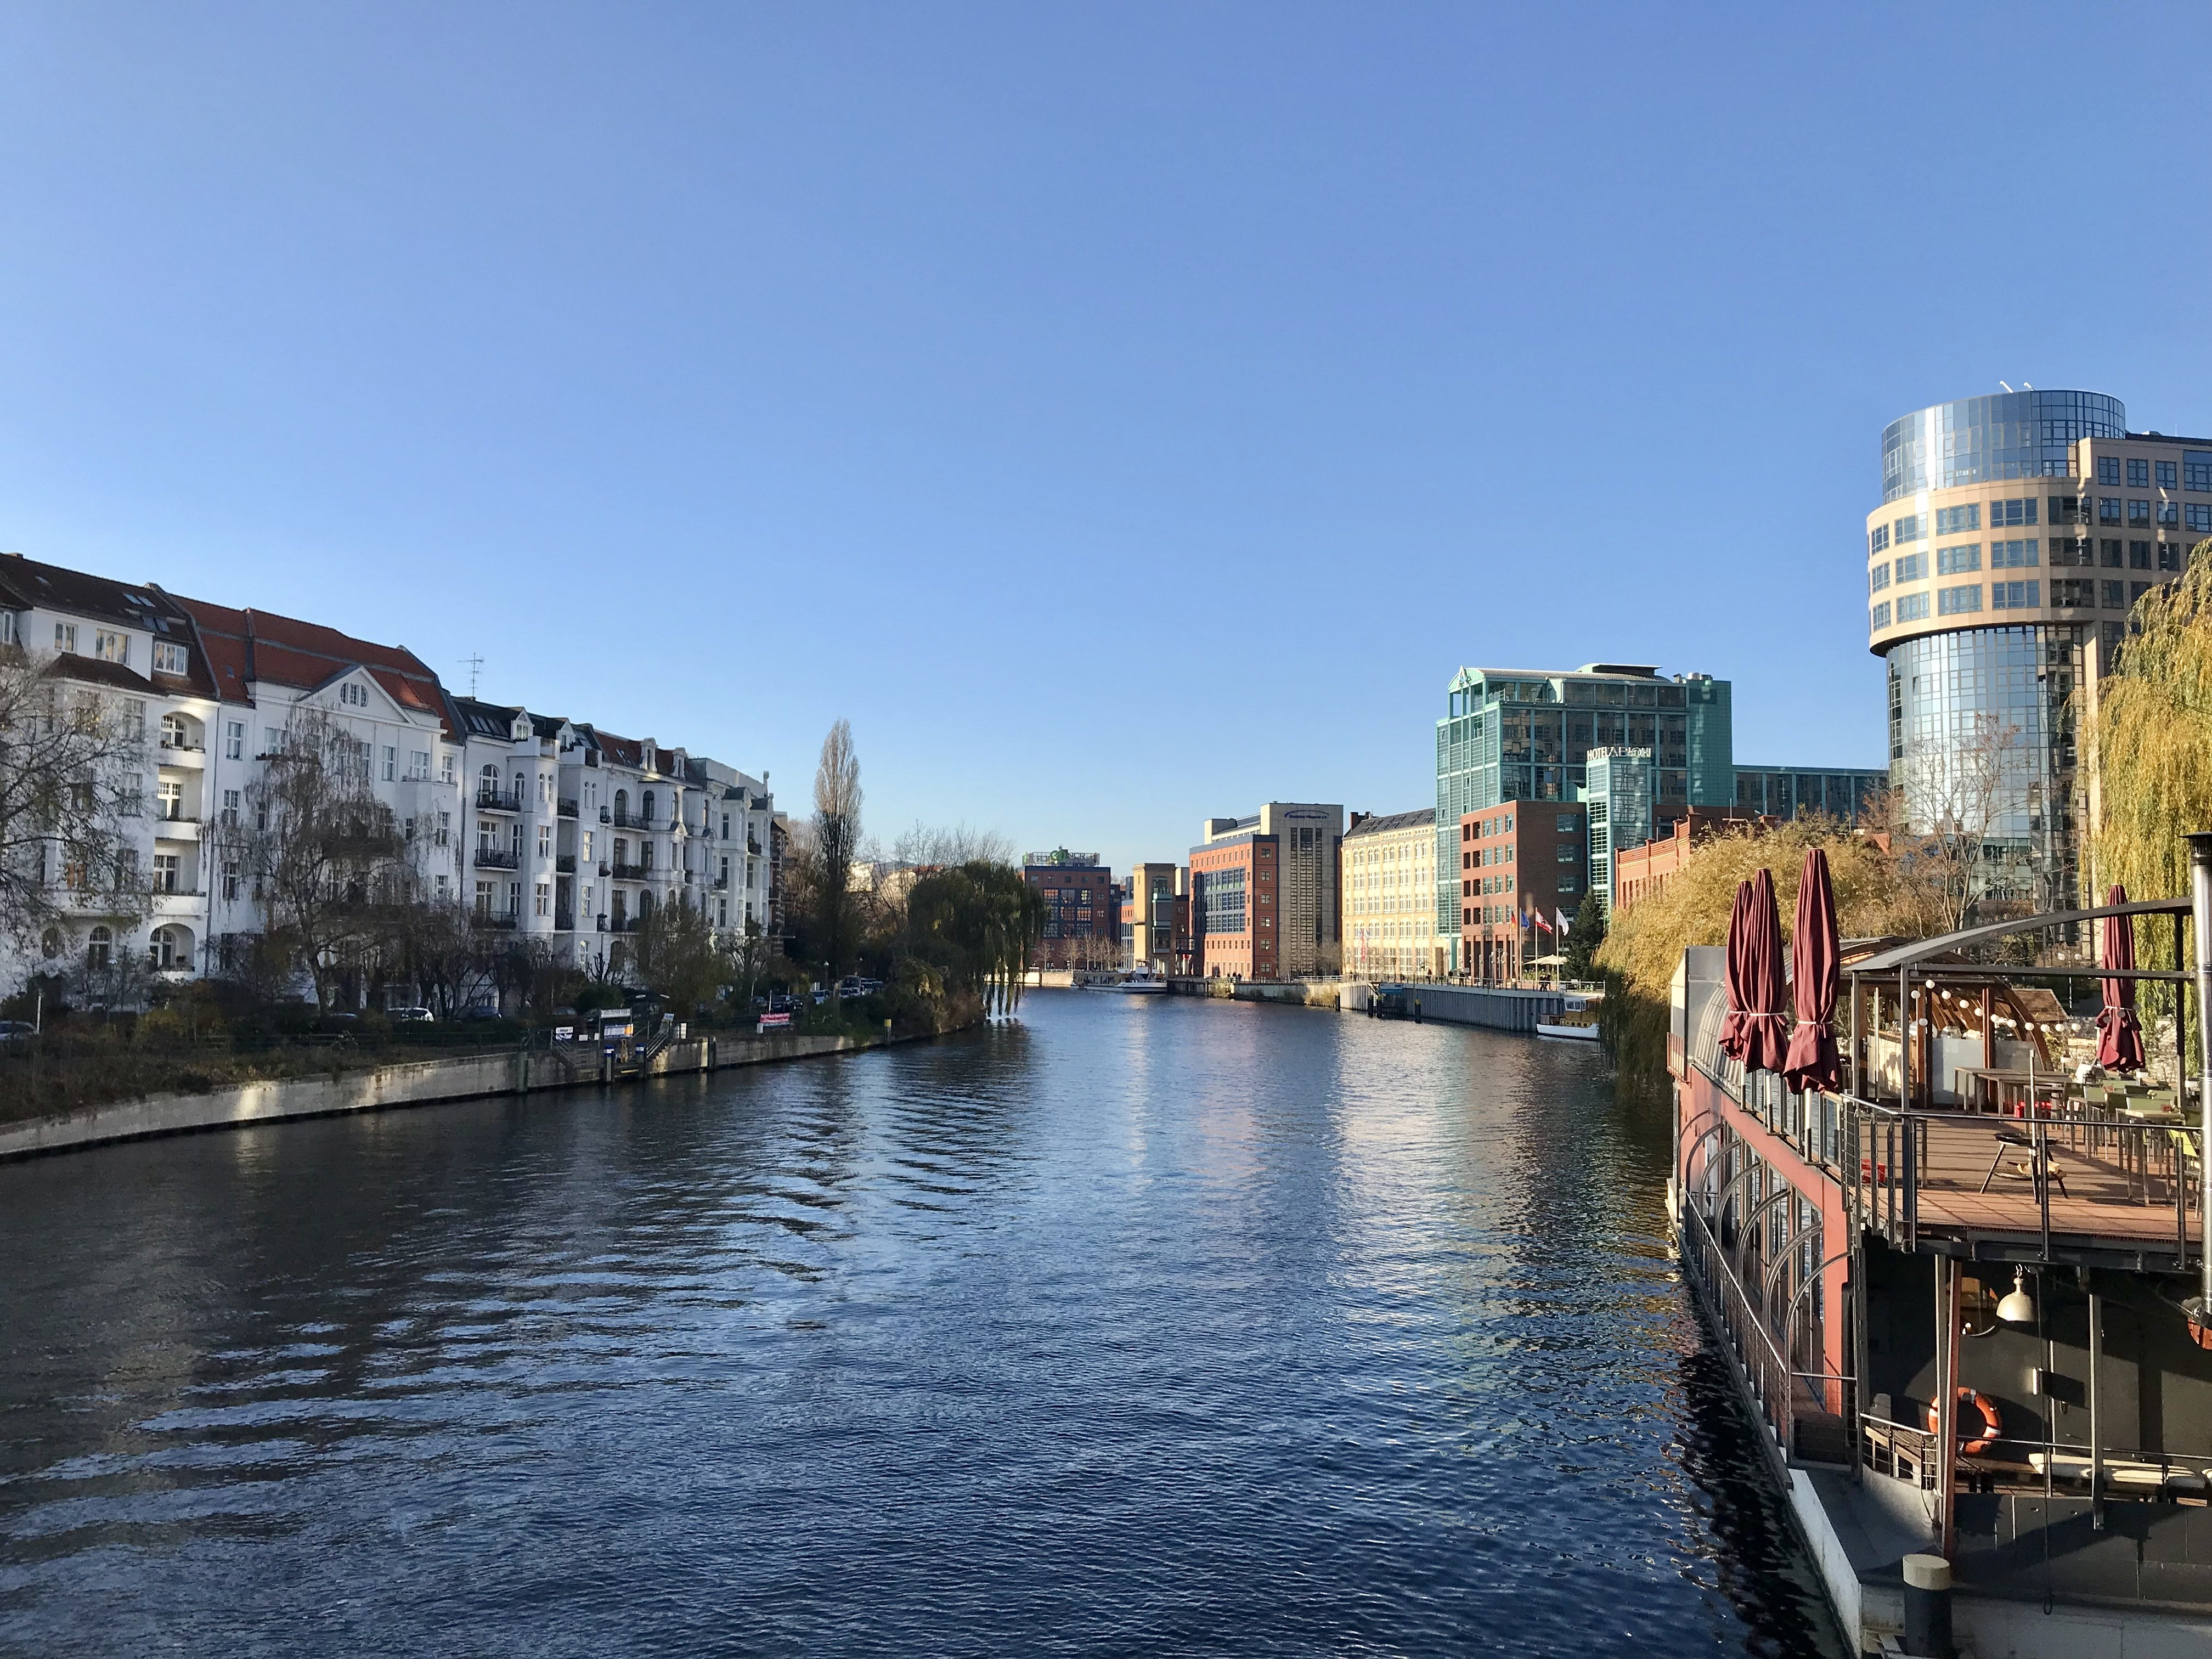 Auf dem Weg in Moabit, Berlin